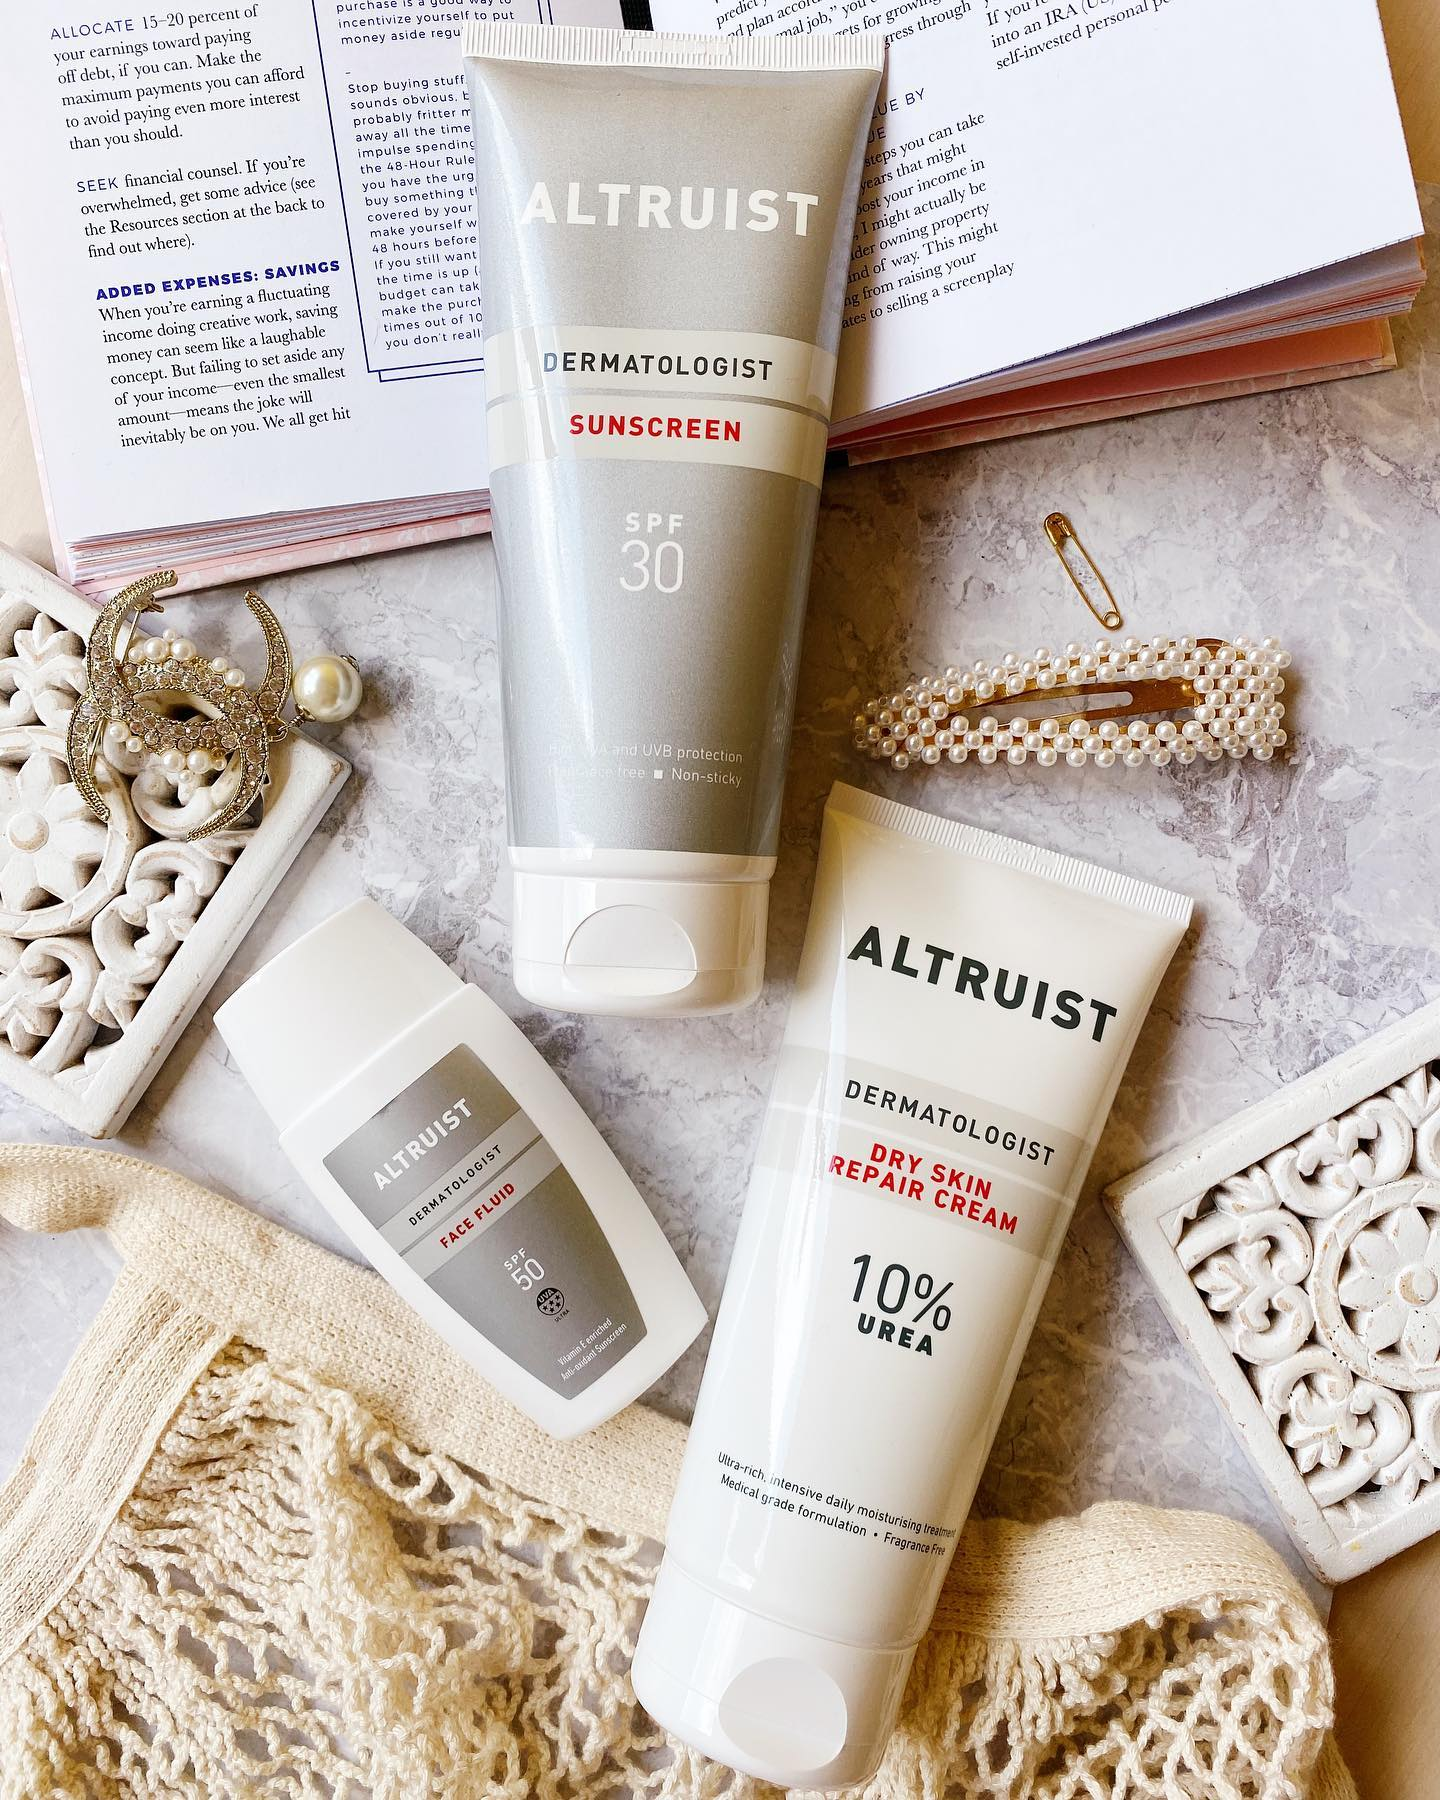 Altruist - Kem dưỡng phục hồi da Altruist Urea 10%   Meow Beauty Shop